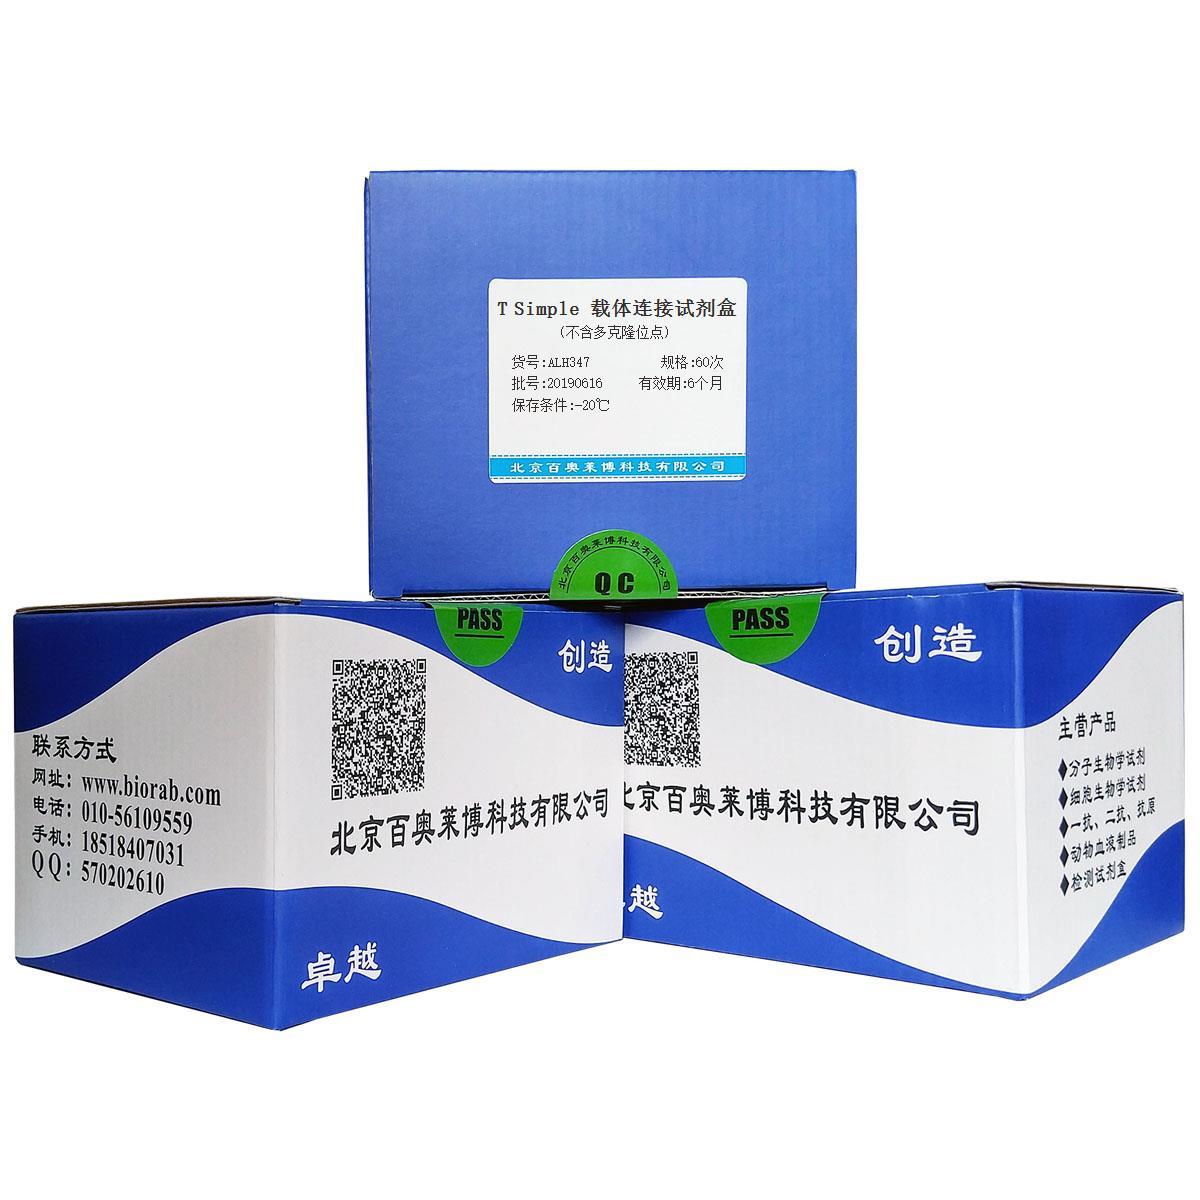 T Simple 载体连接试剂盒(不含多克隆位点)